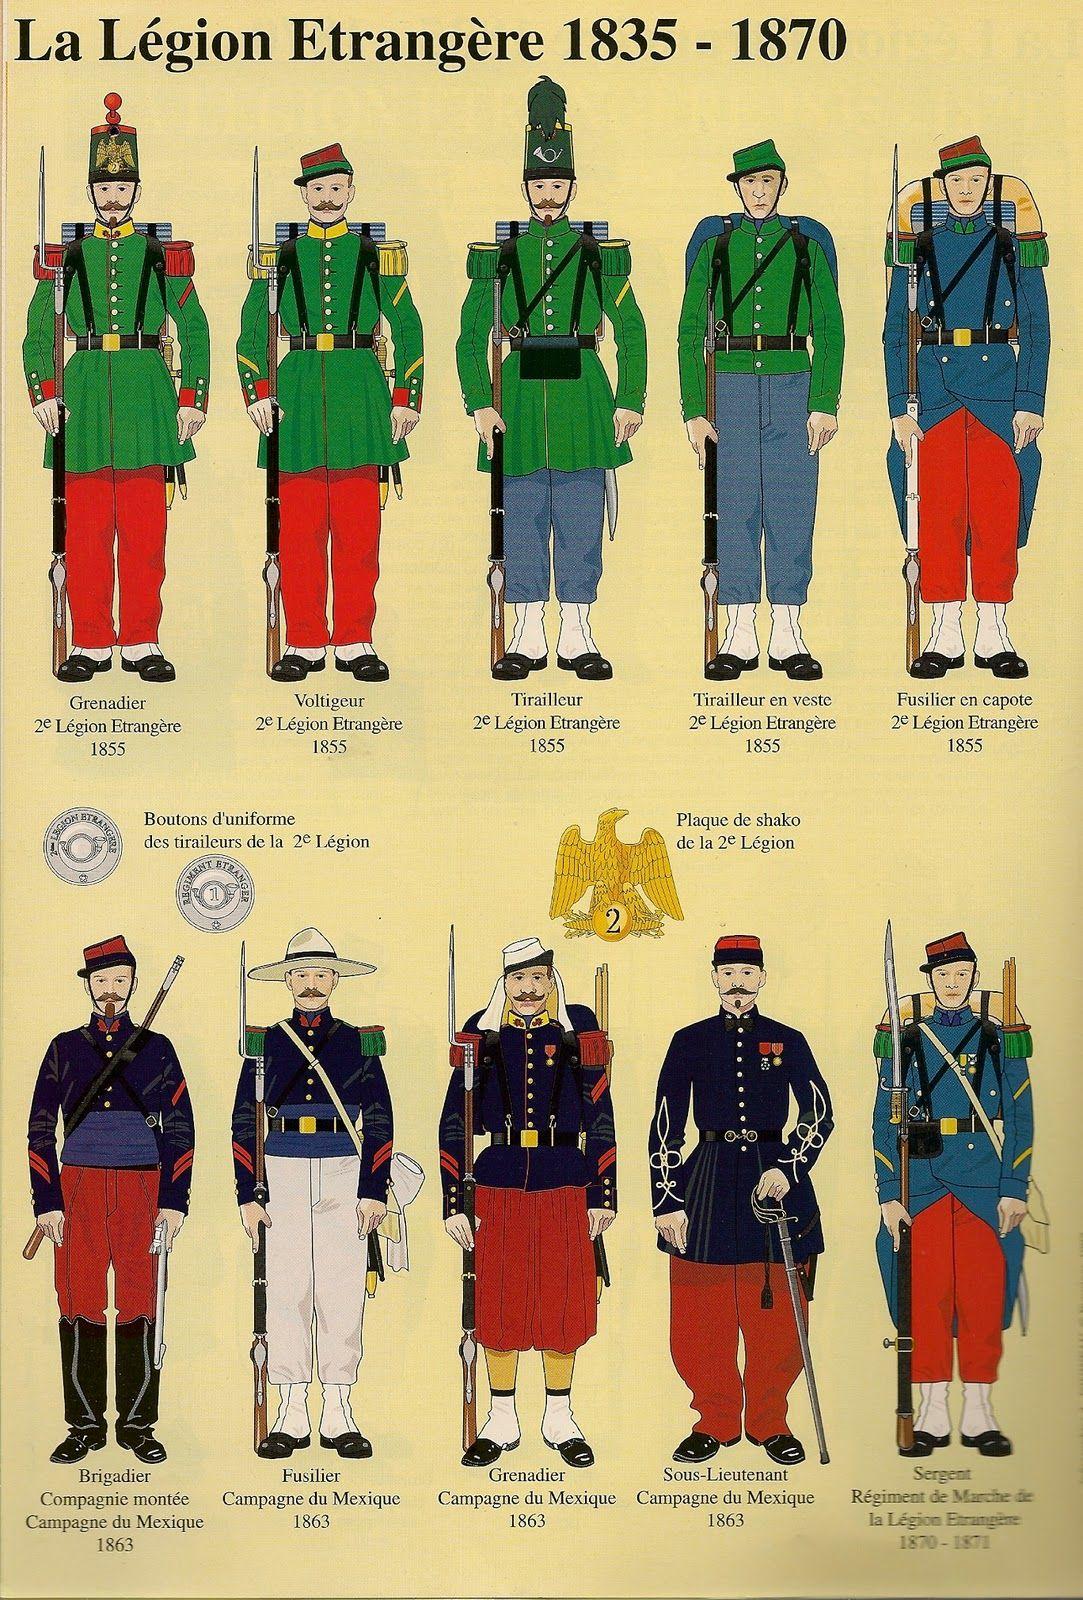 French Foreign Legion (1835 - 1870)